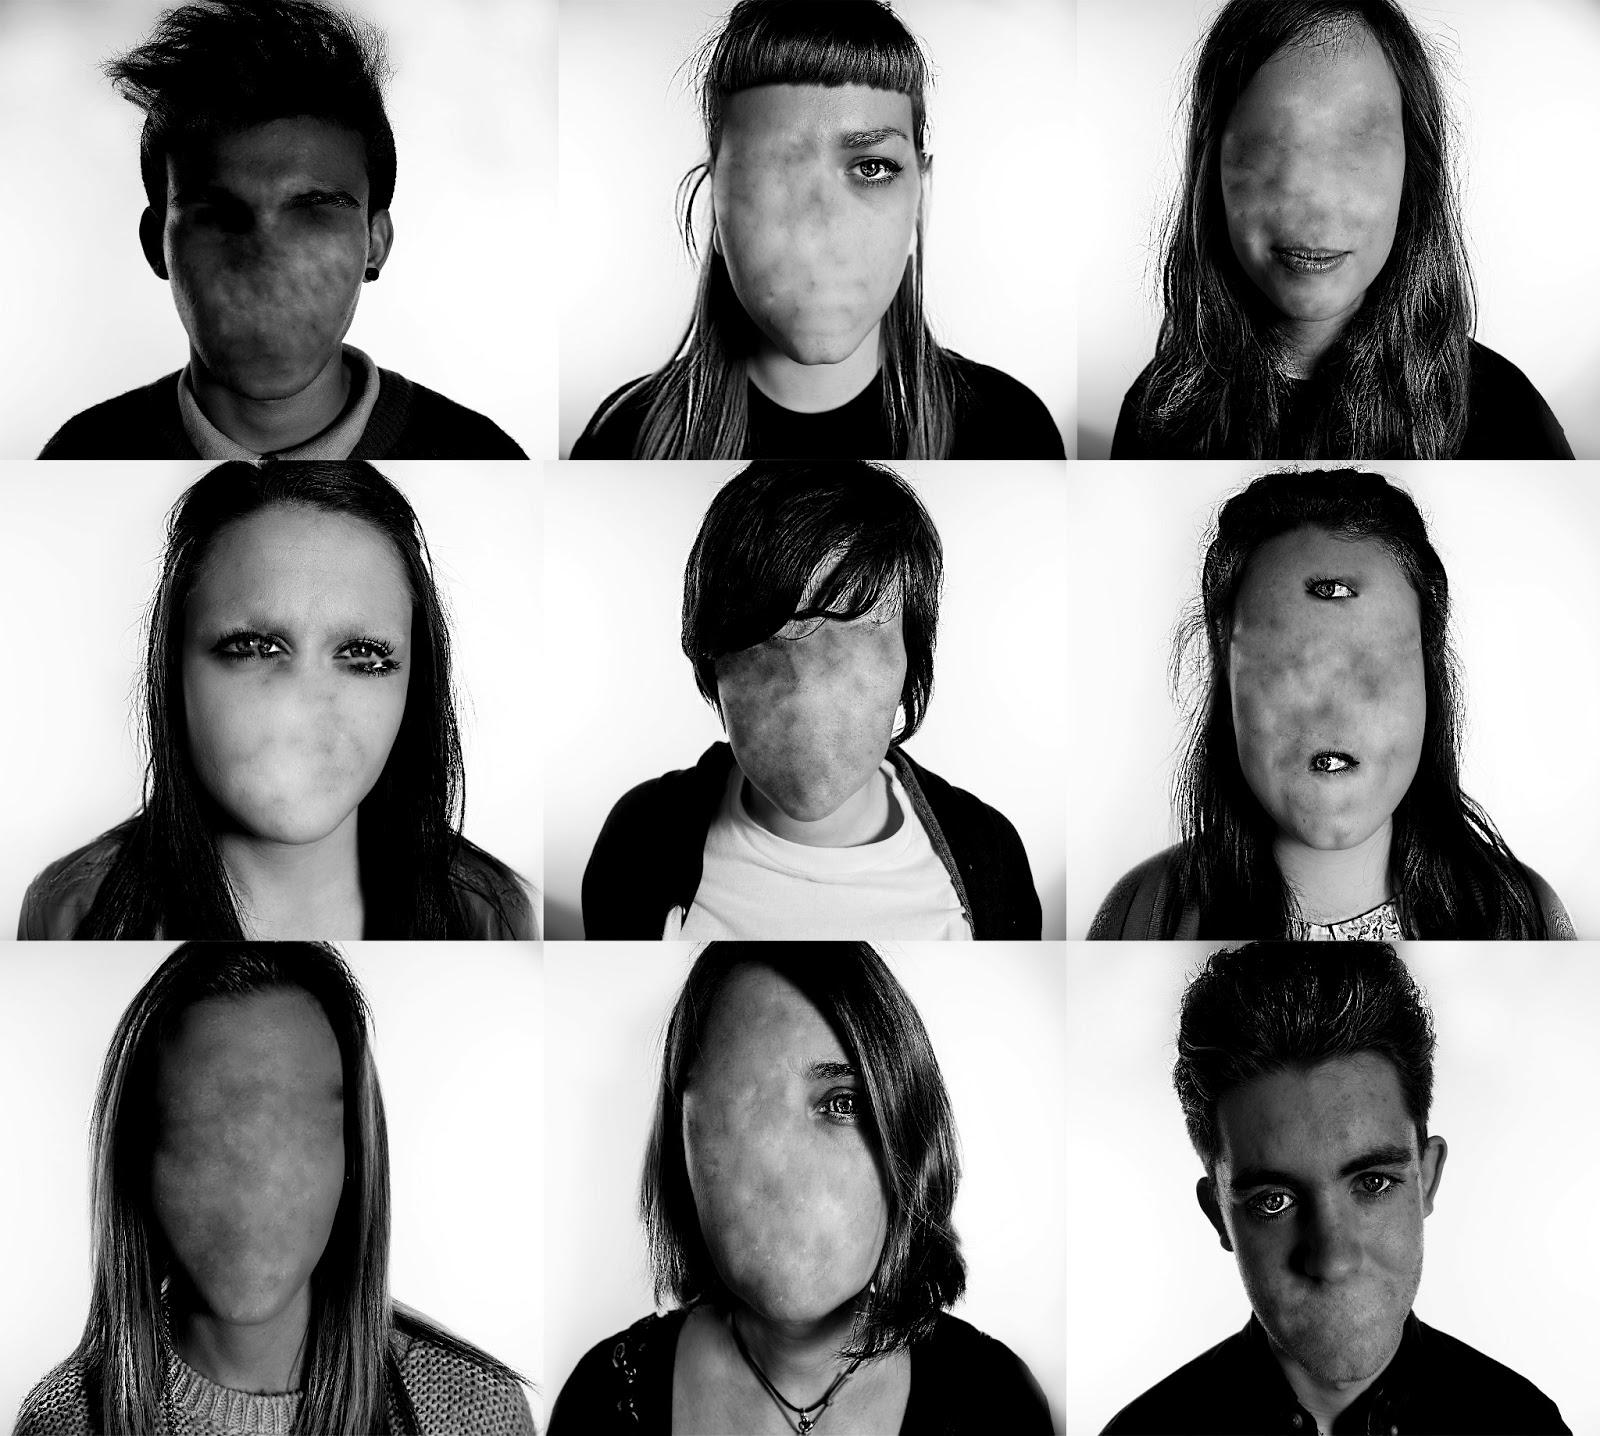 Jordan Germanotta Photography Faceless Portraits face photo manipulation